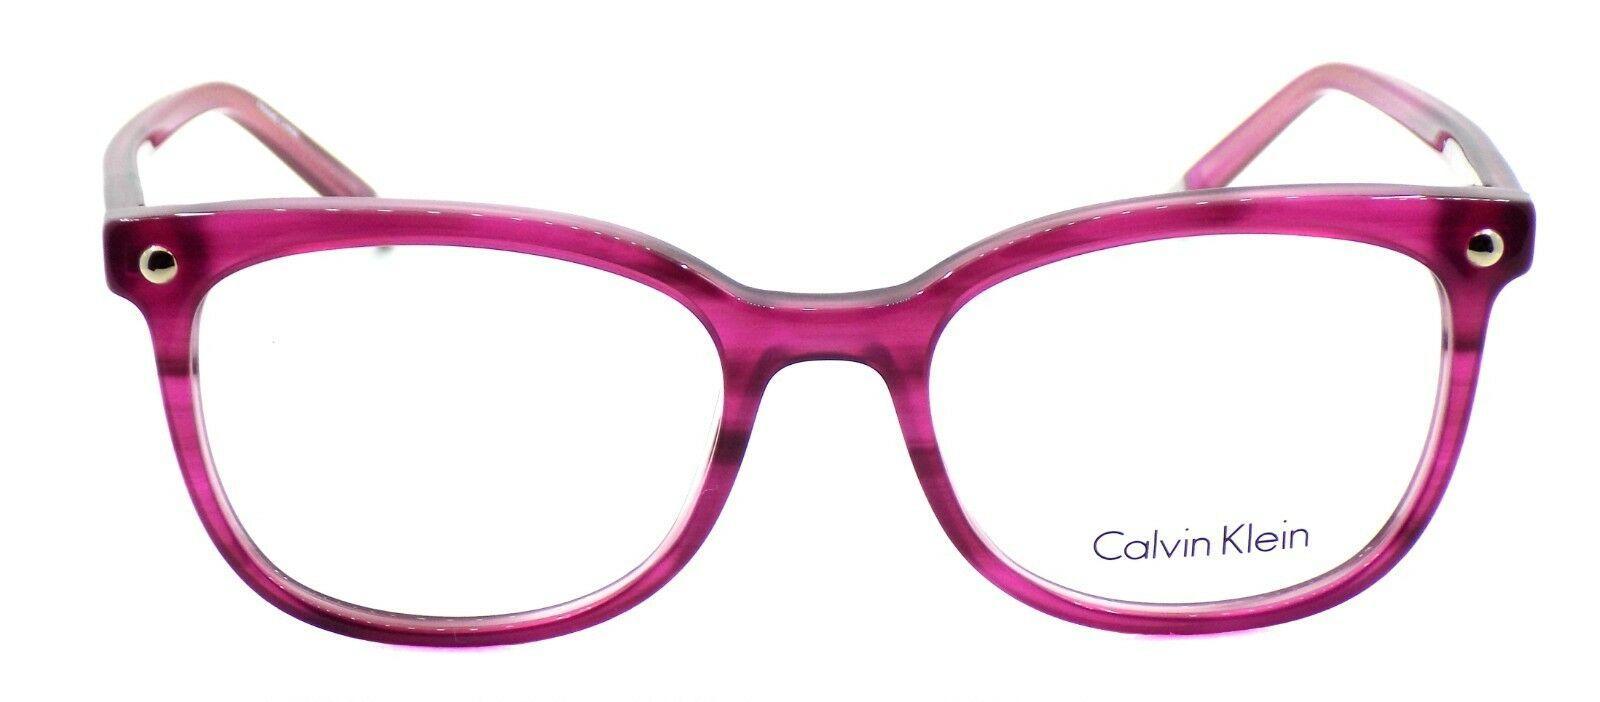 Calvin Klein CK5972 606 Women's Eyeglasses Frames Cyclamen 52-18-140 + CASE